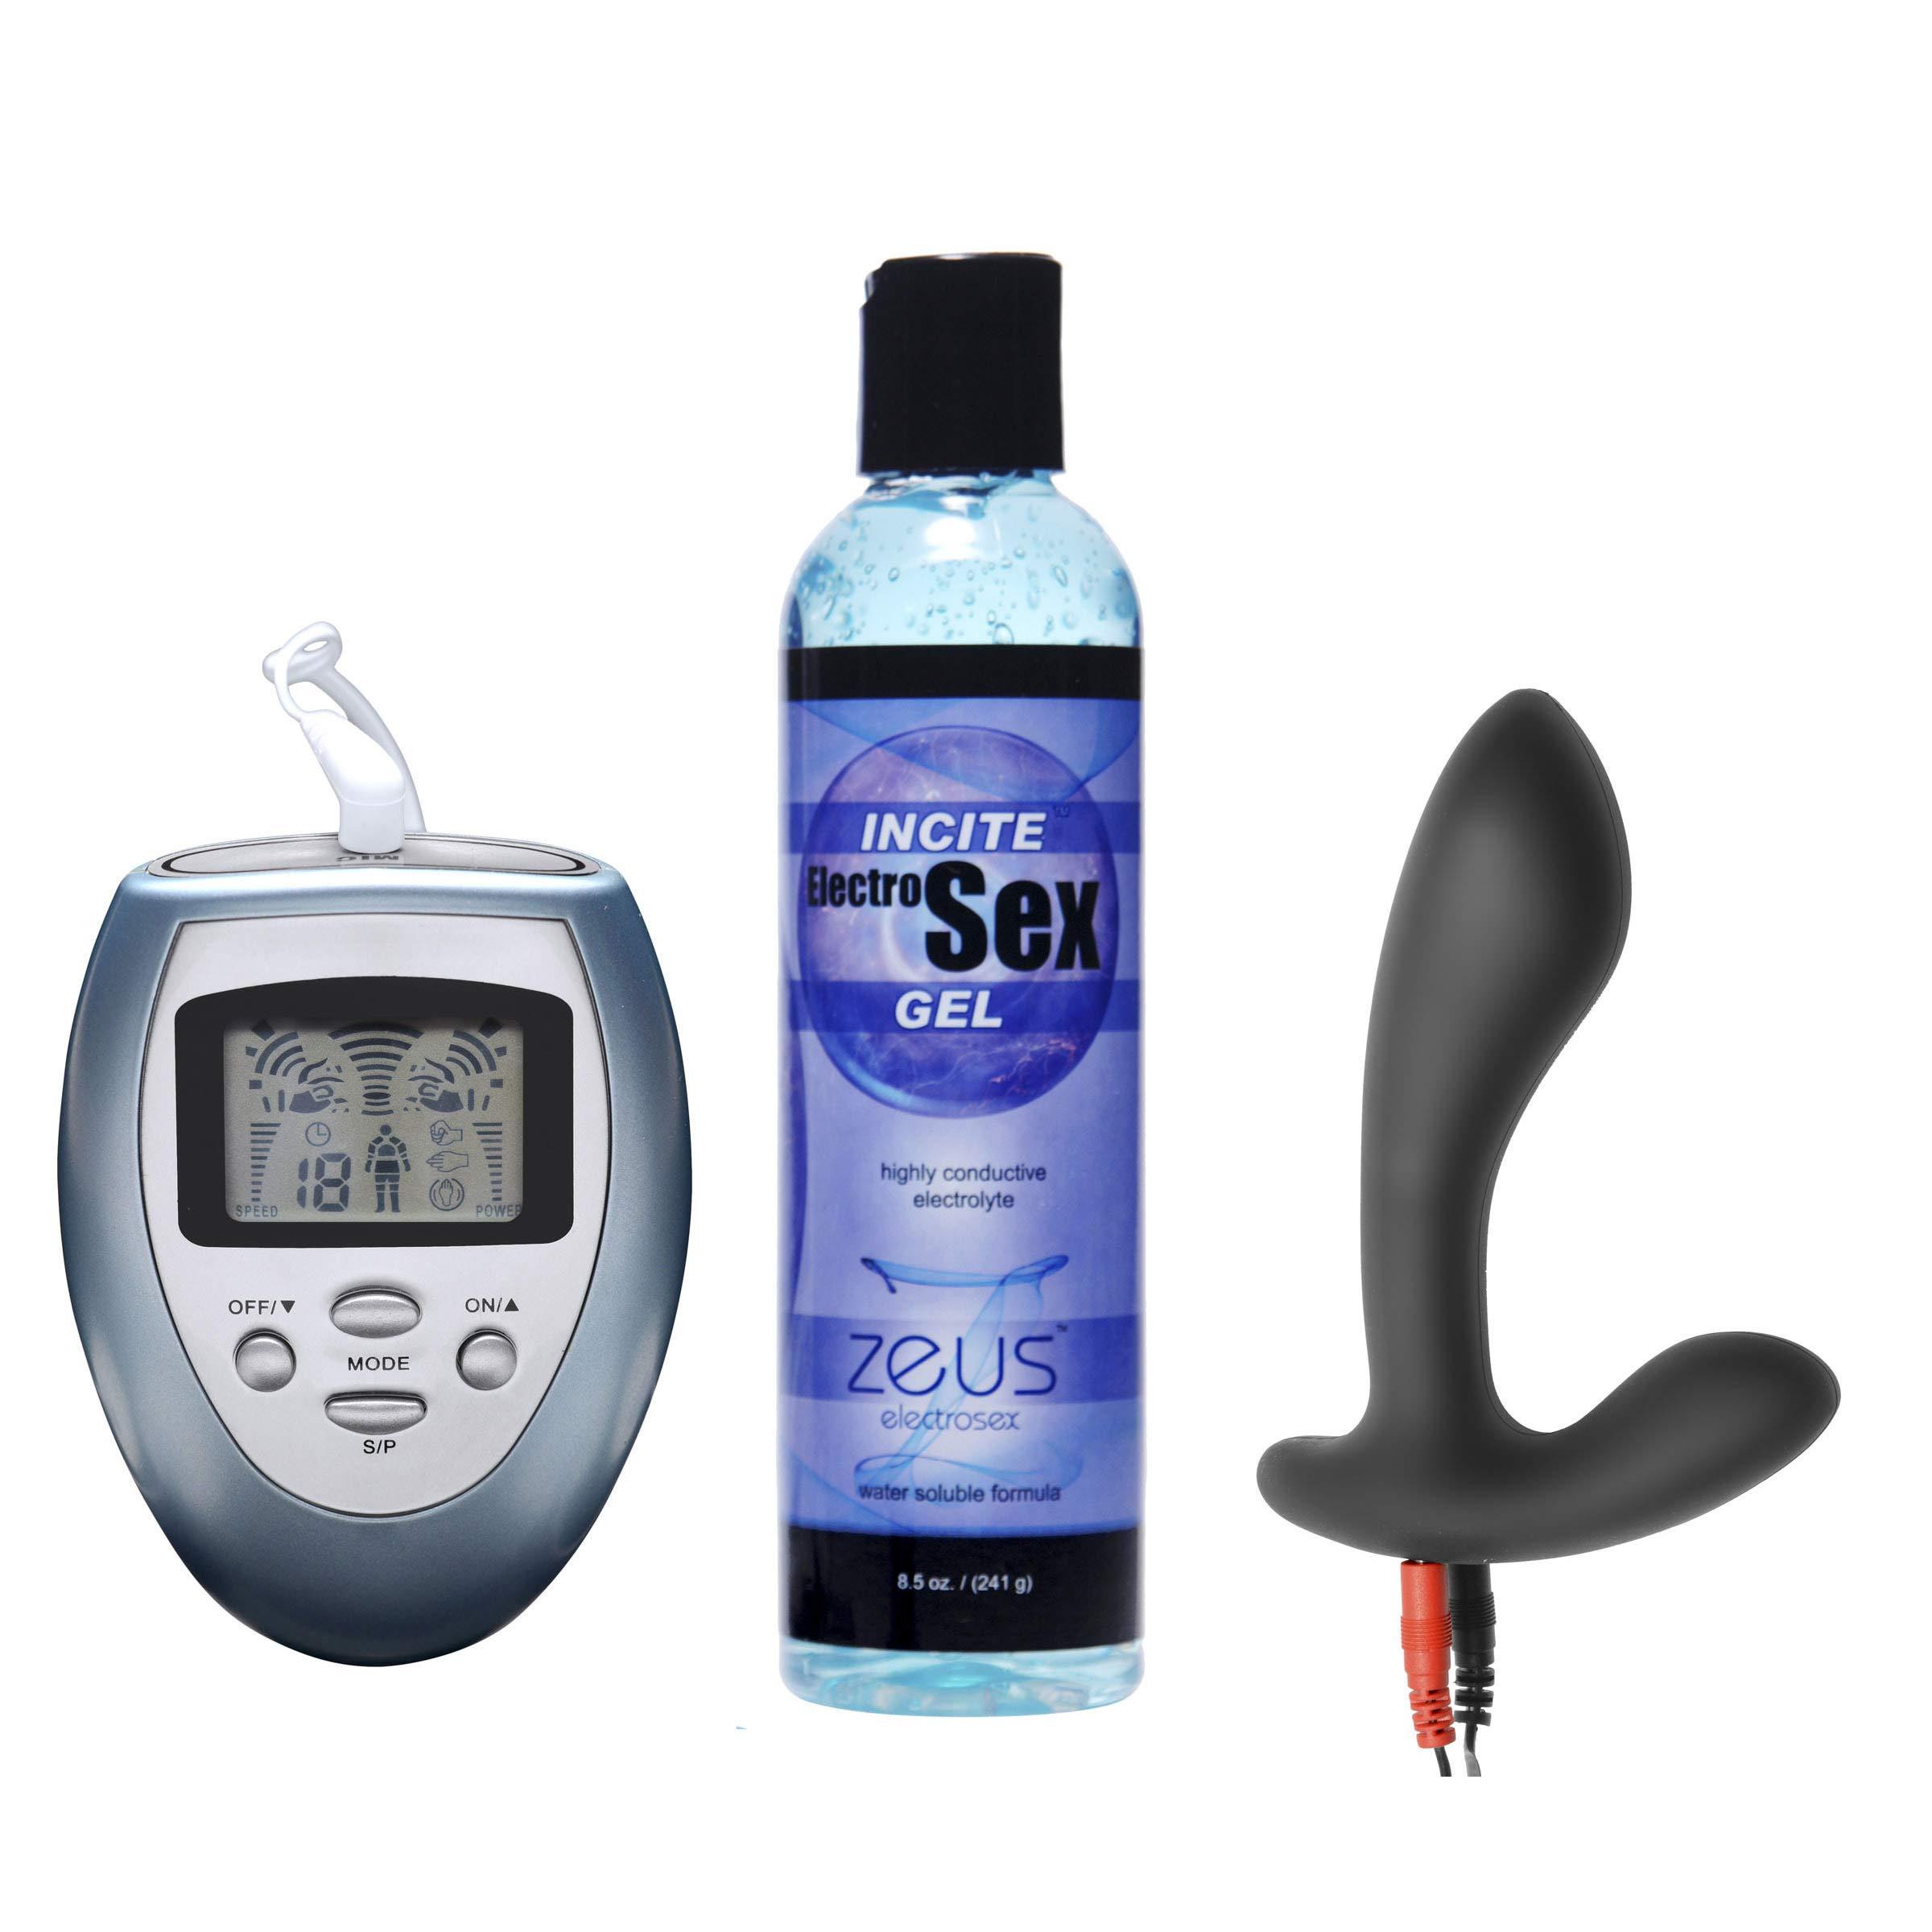 Electrify Your Prostate Silicone Estim Kit by Zeus Electrosex